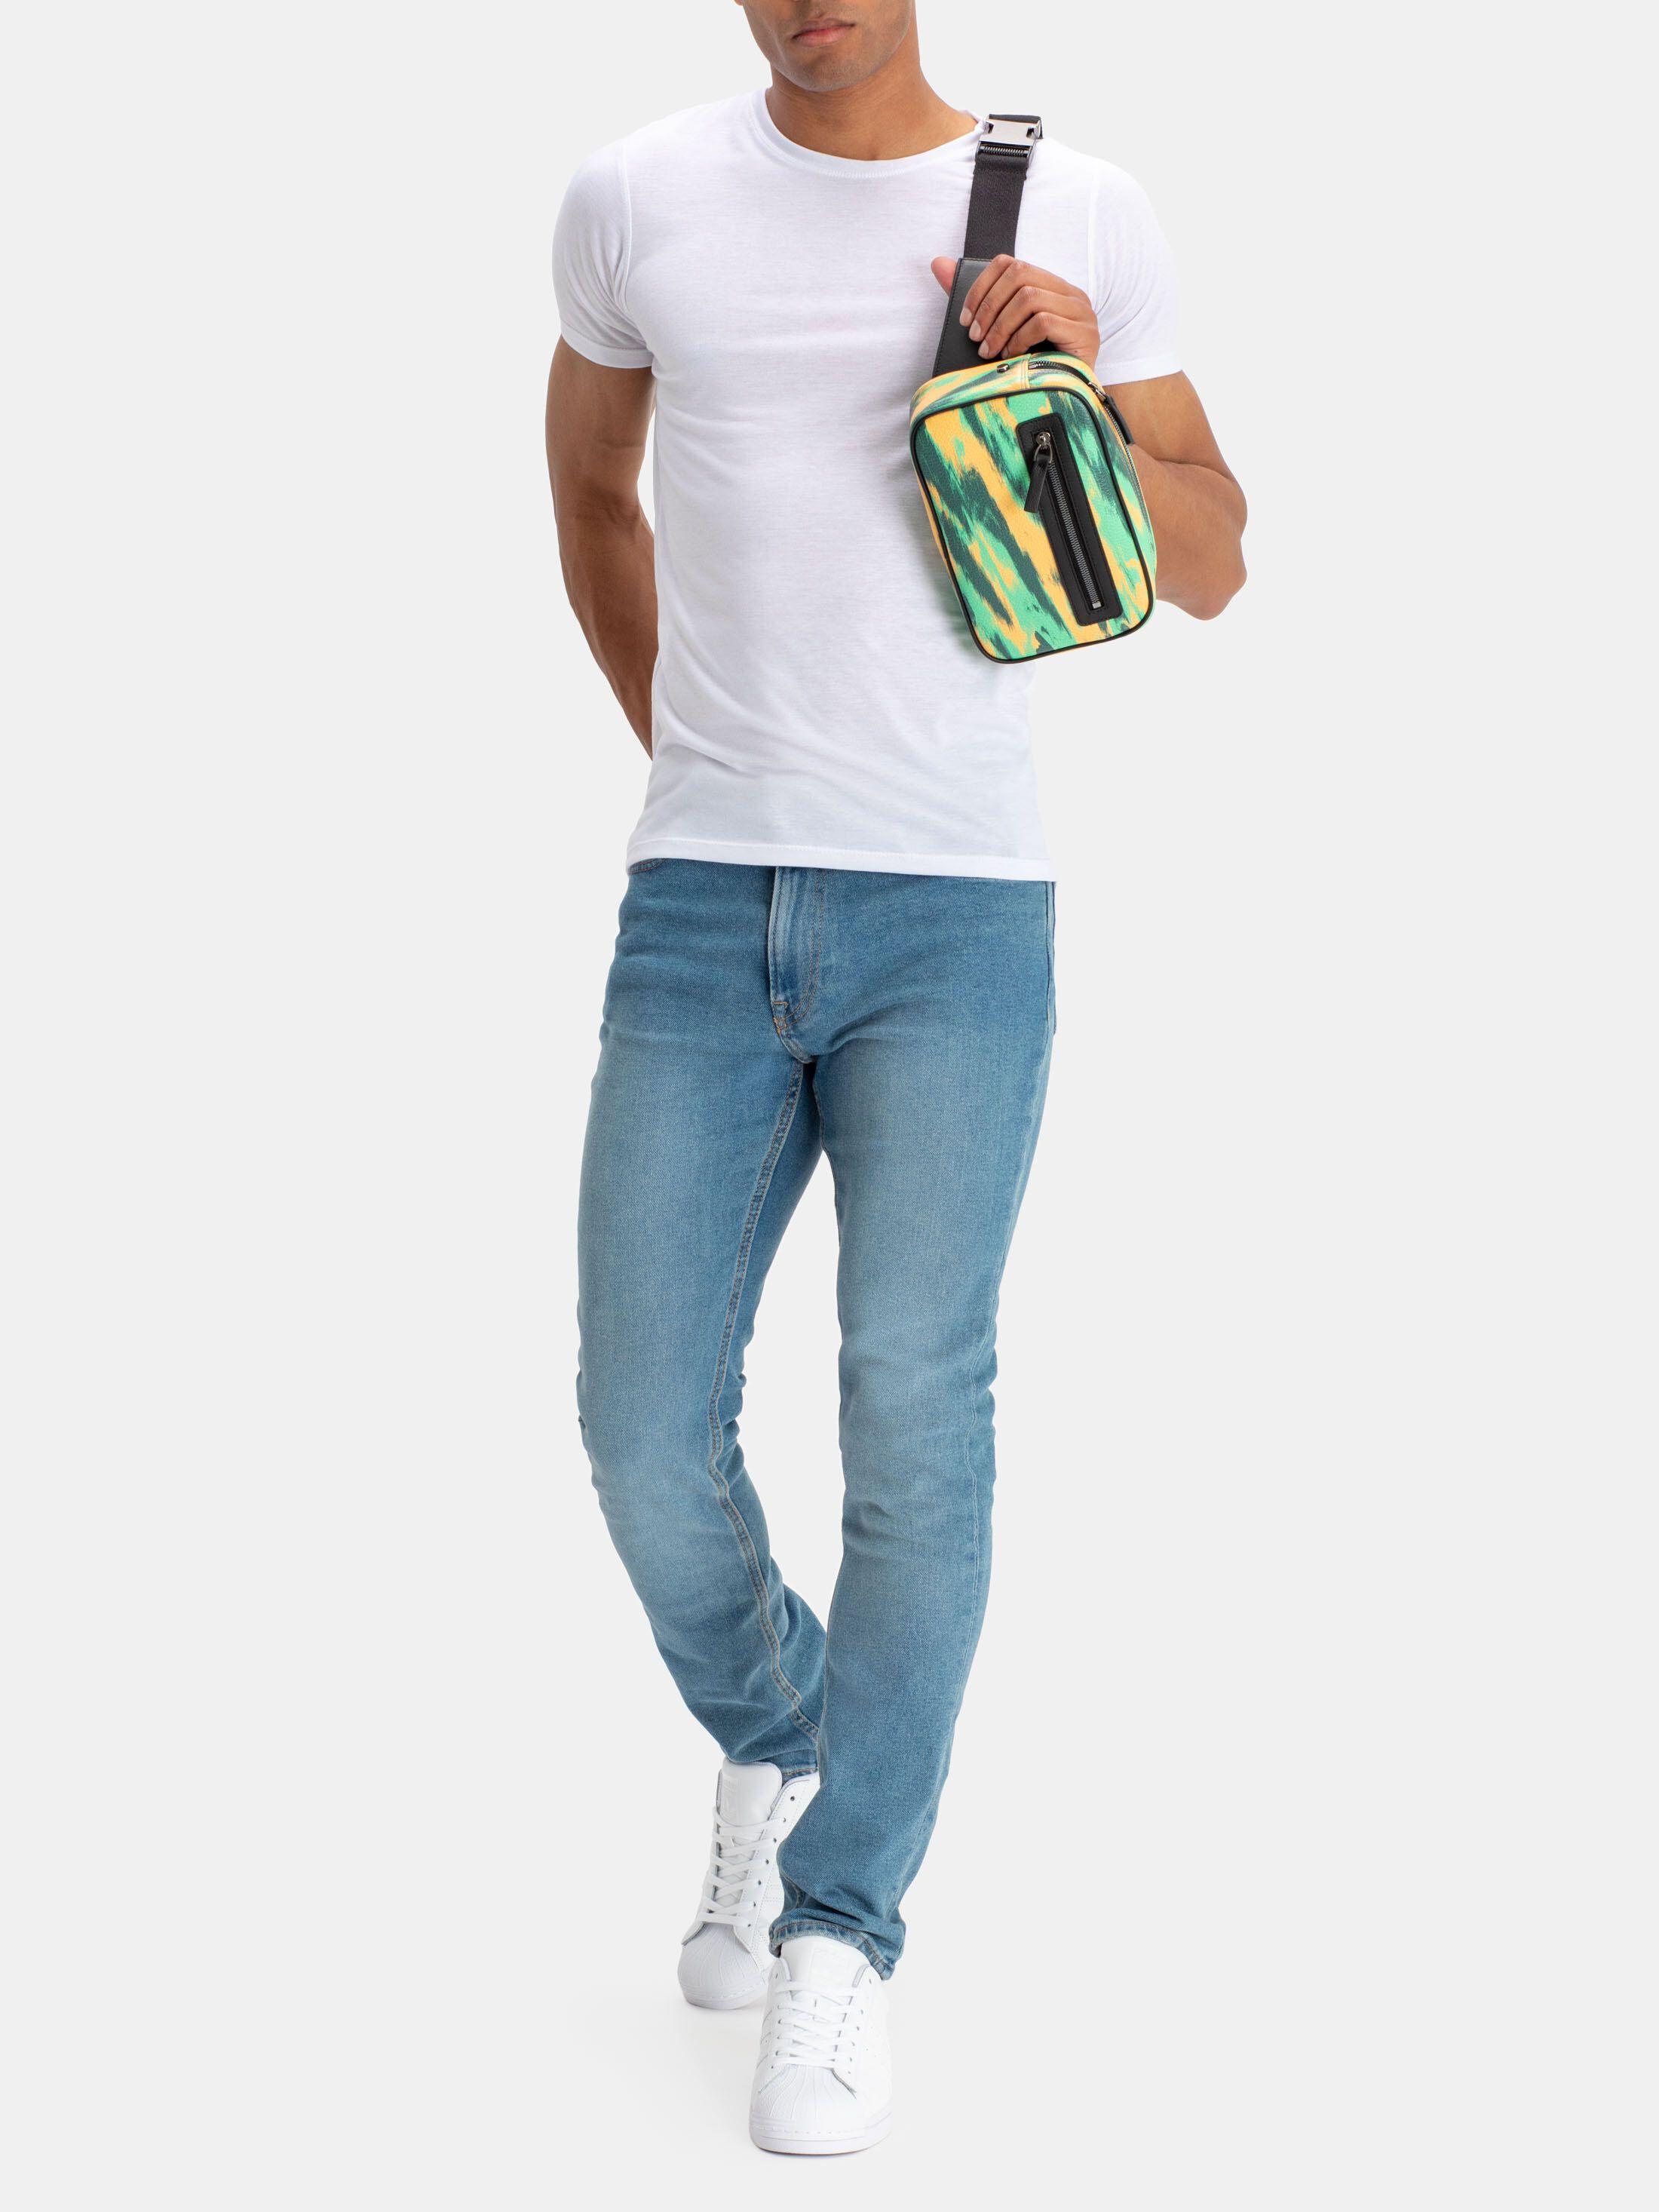 Custom bum bags uk